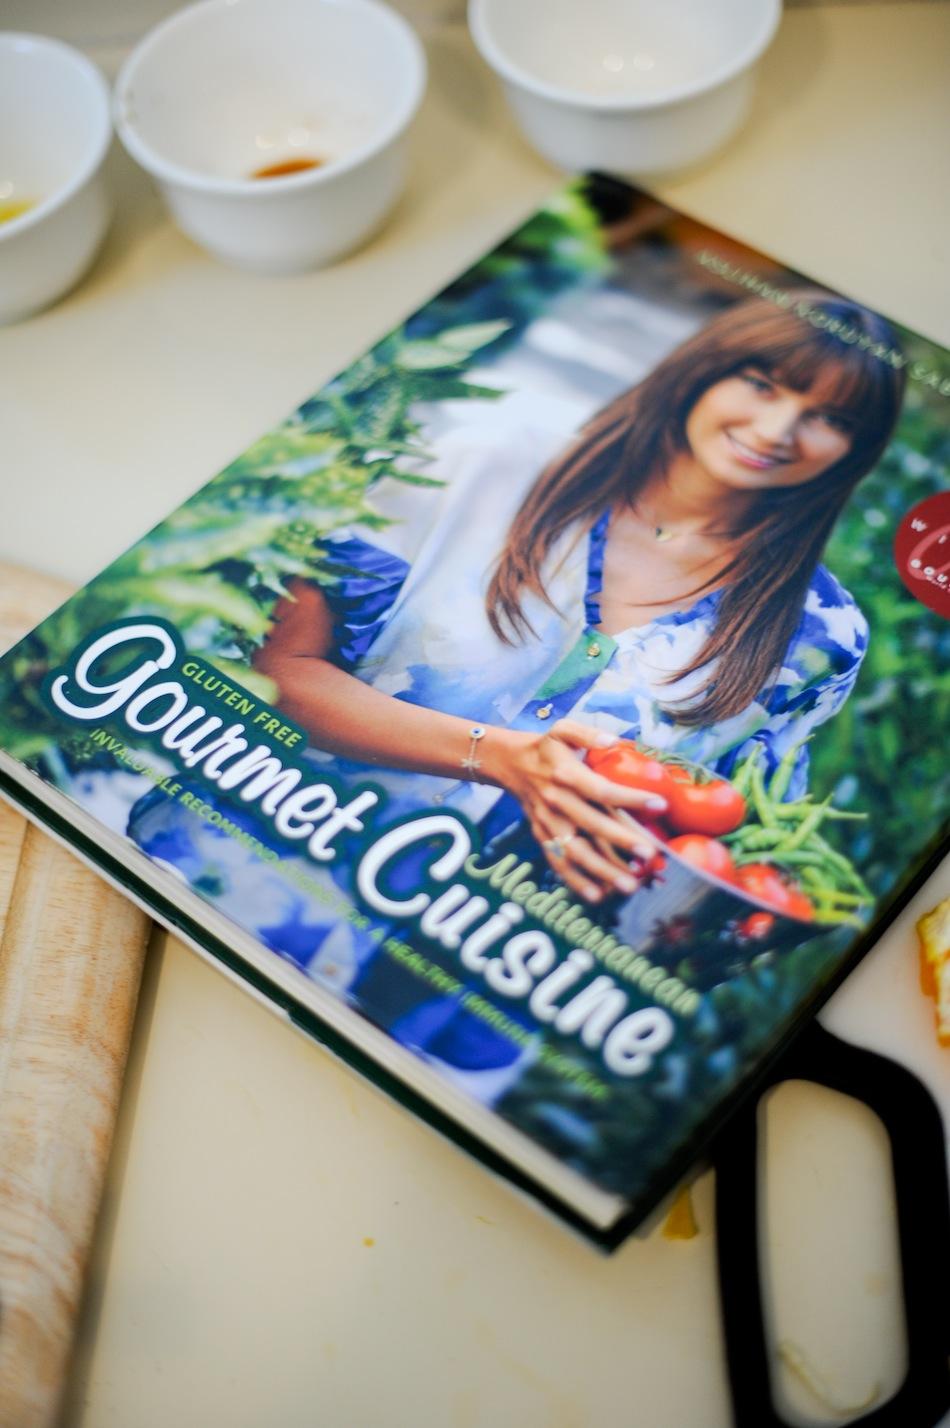 Book Gluten Free 'Mediterranean' Gourmet Cuisine  by Aslıhan Koruyan Sabancı